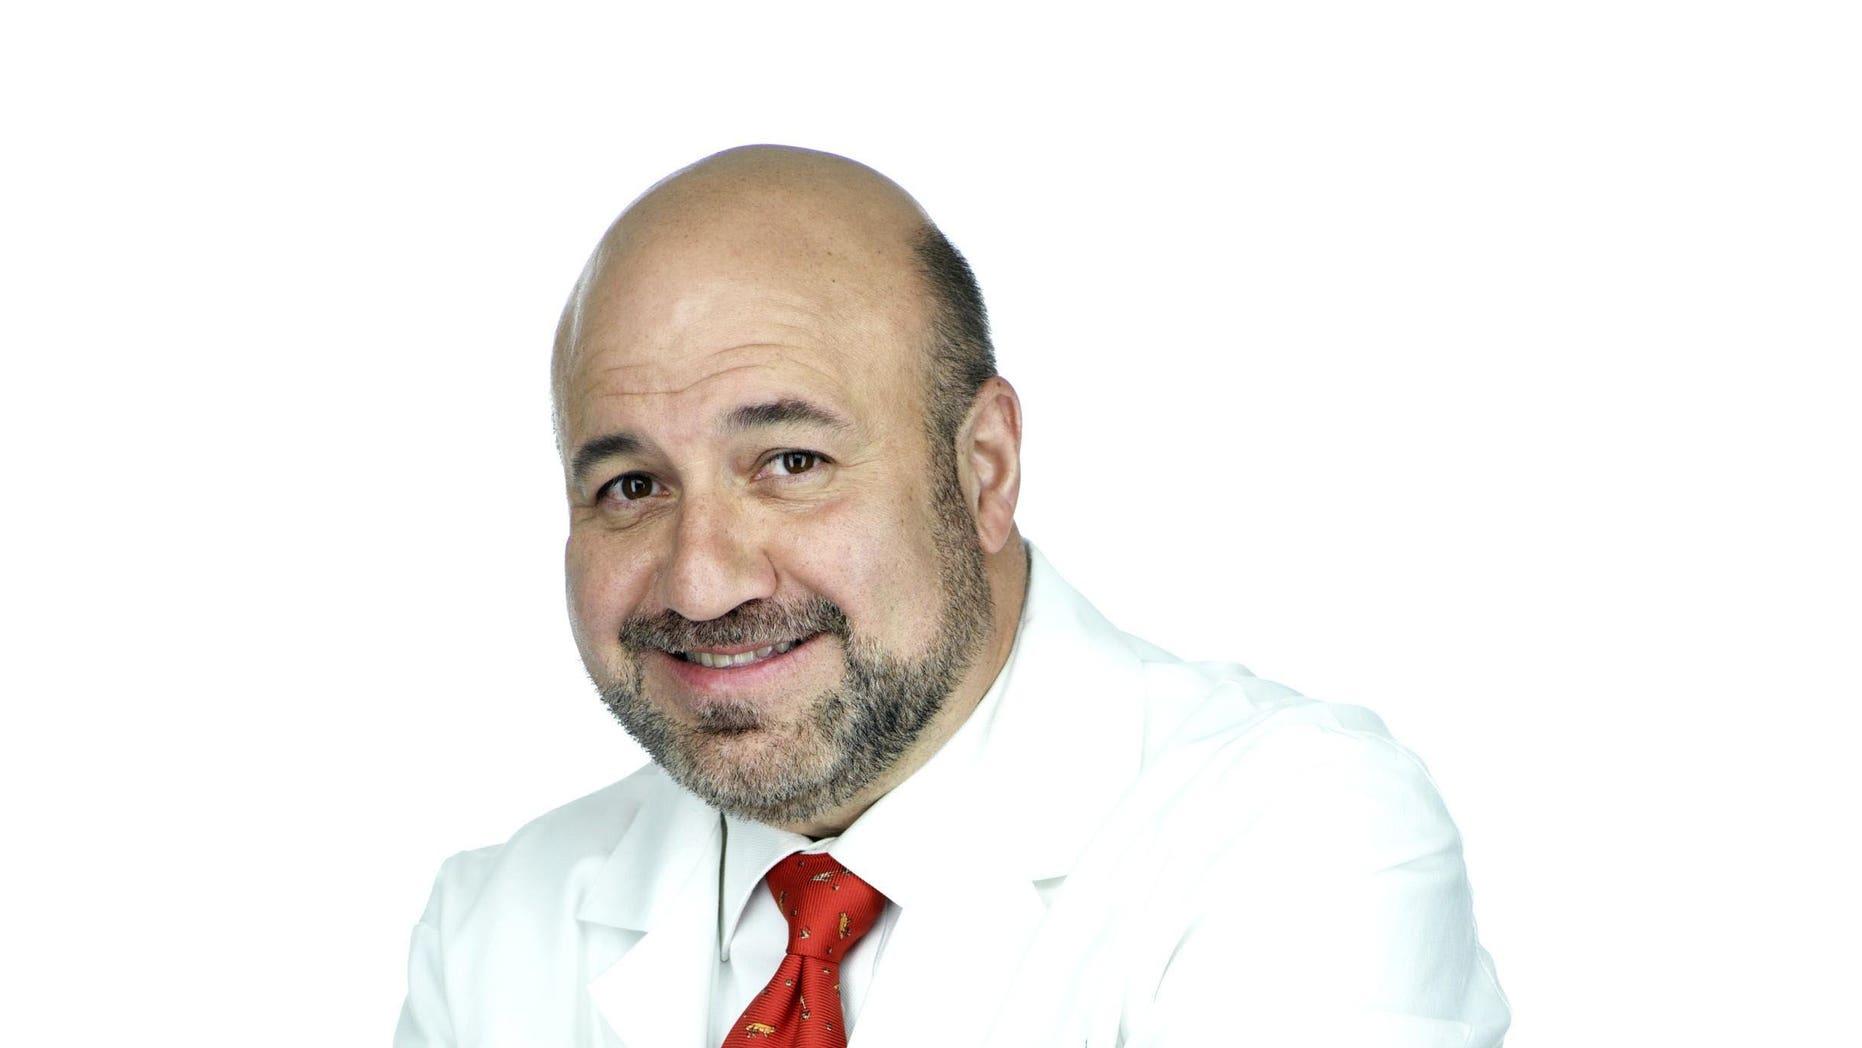 Dr. Manny Alvarez